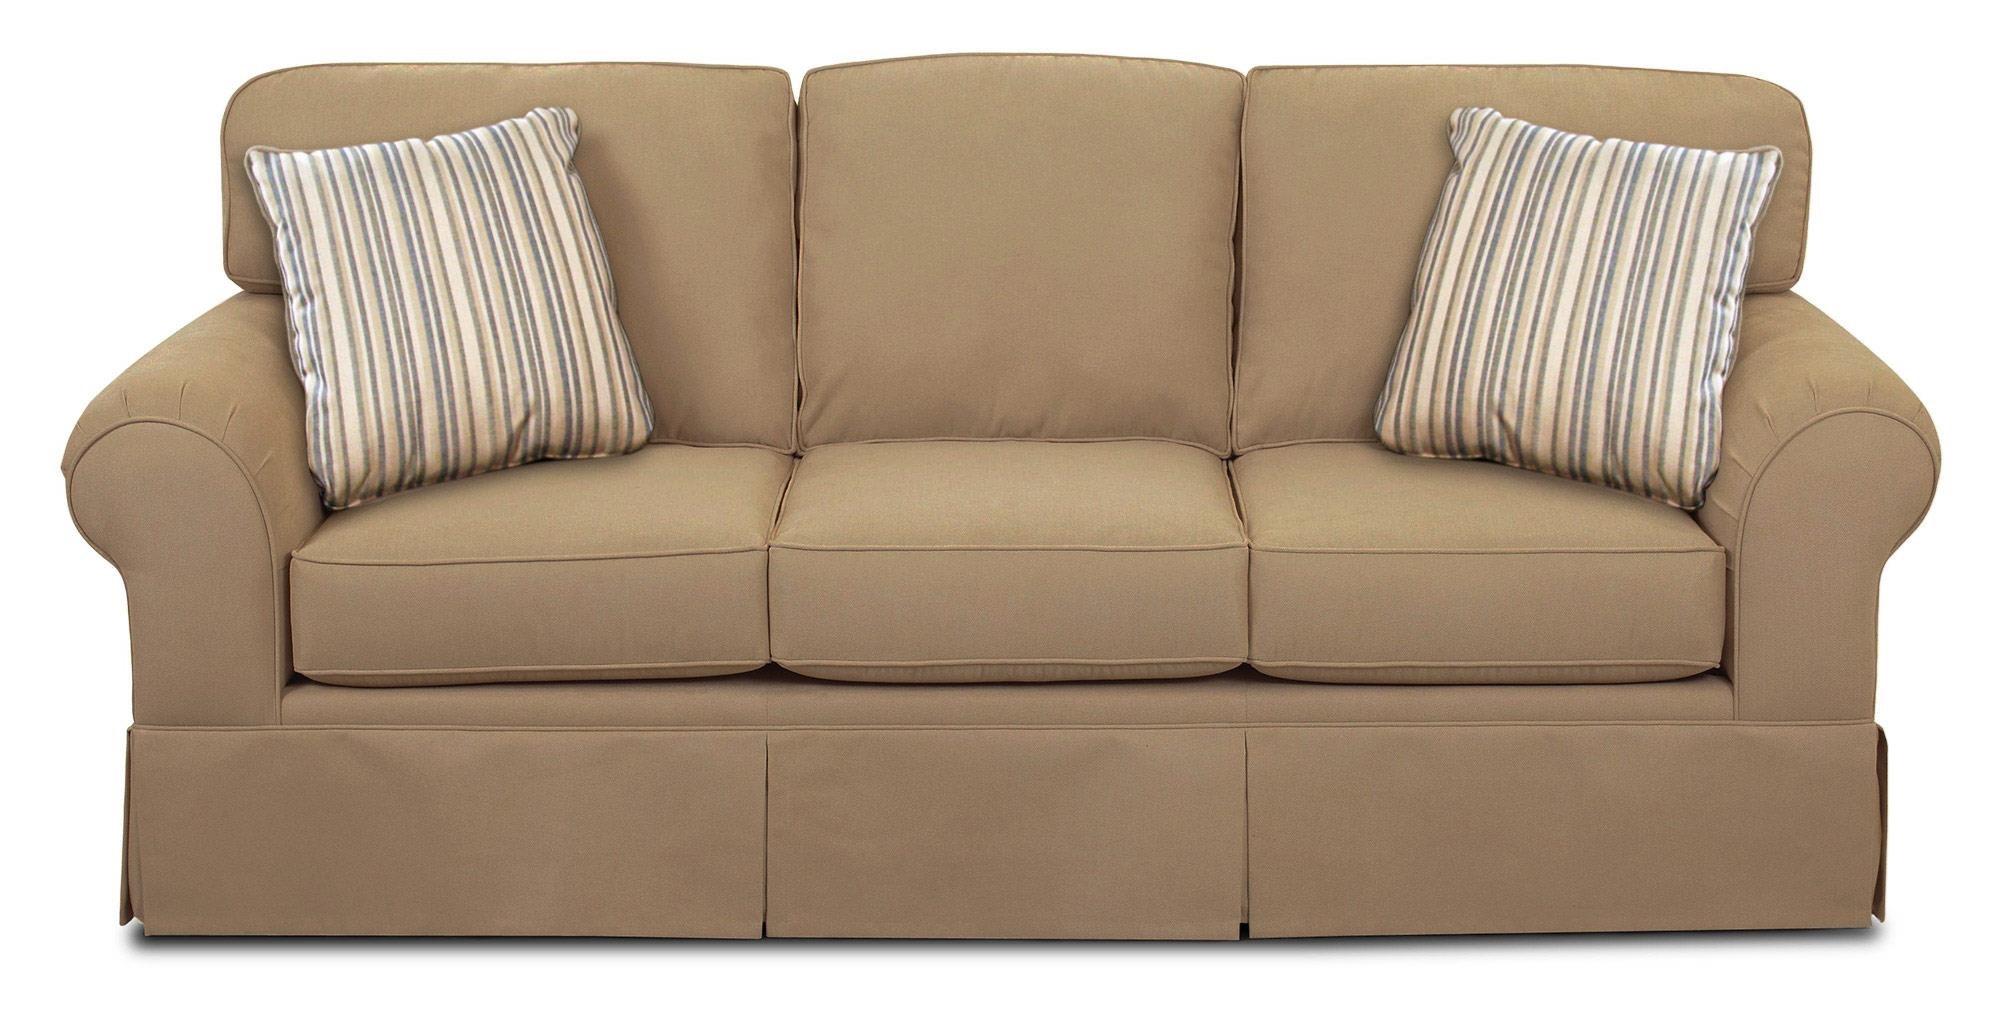 simple elegance asana casual skirted sofa w sunbrella fabric - Sunbrella Fabric